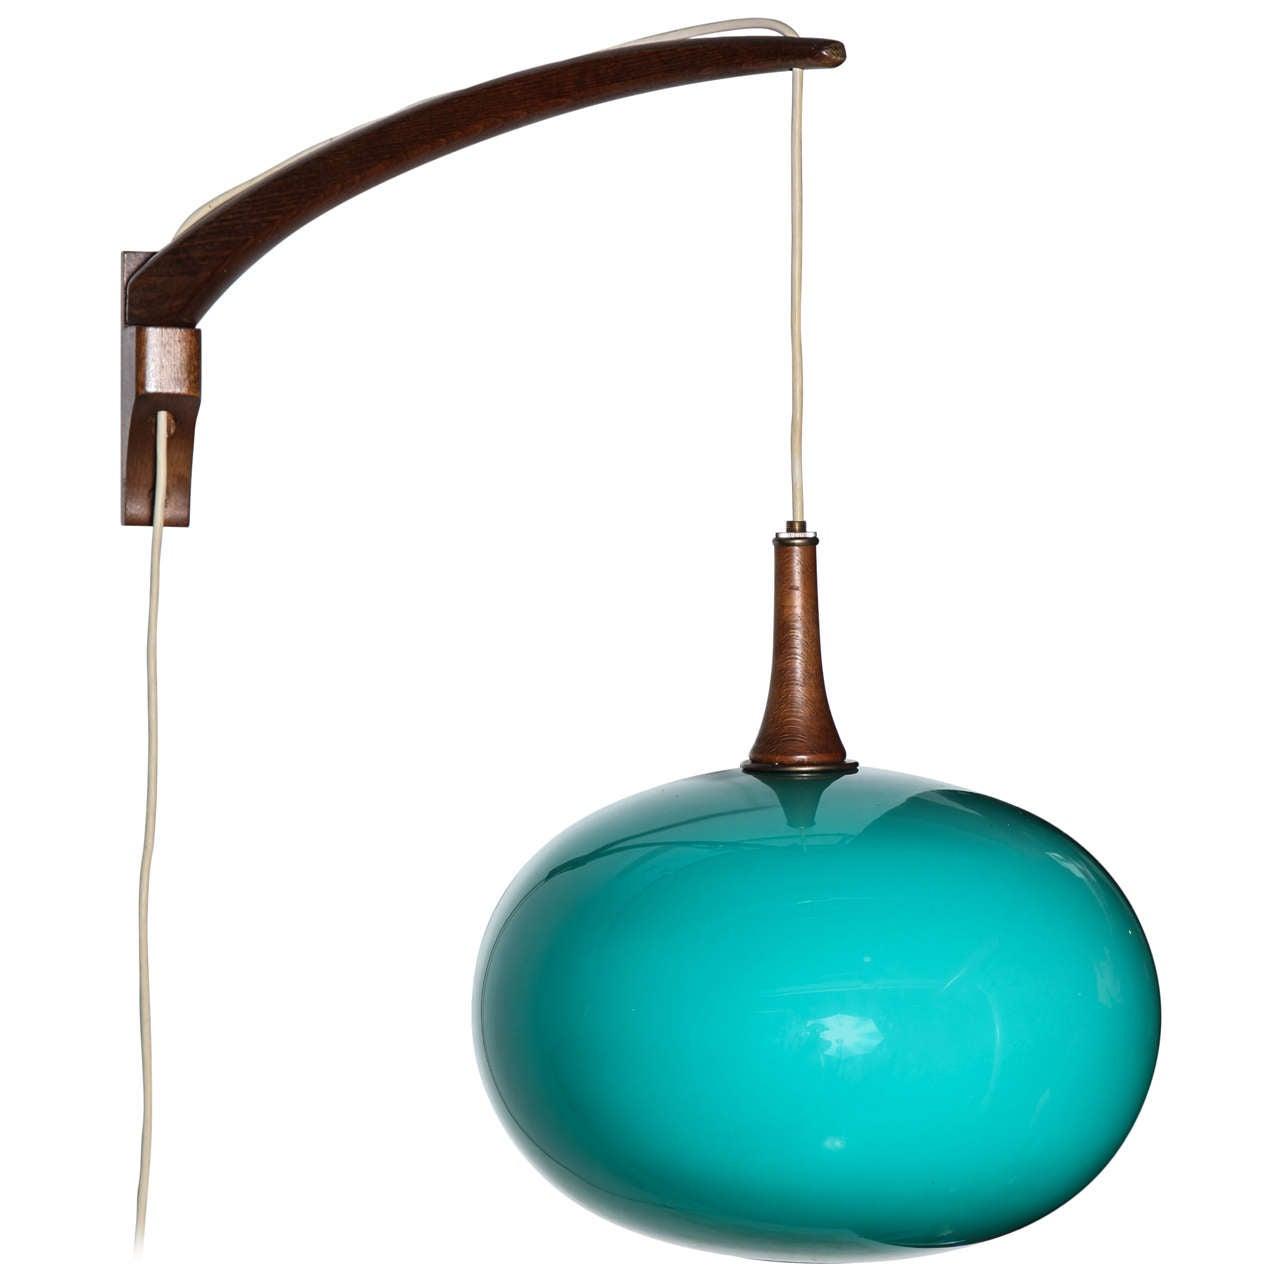 Adjustable Wall Lights Contemporary : Mid Century Modern Adjustable Wall Lamp at 1stdibs